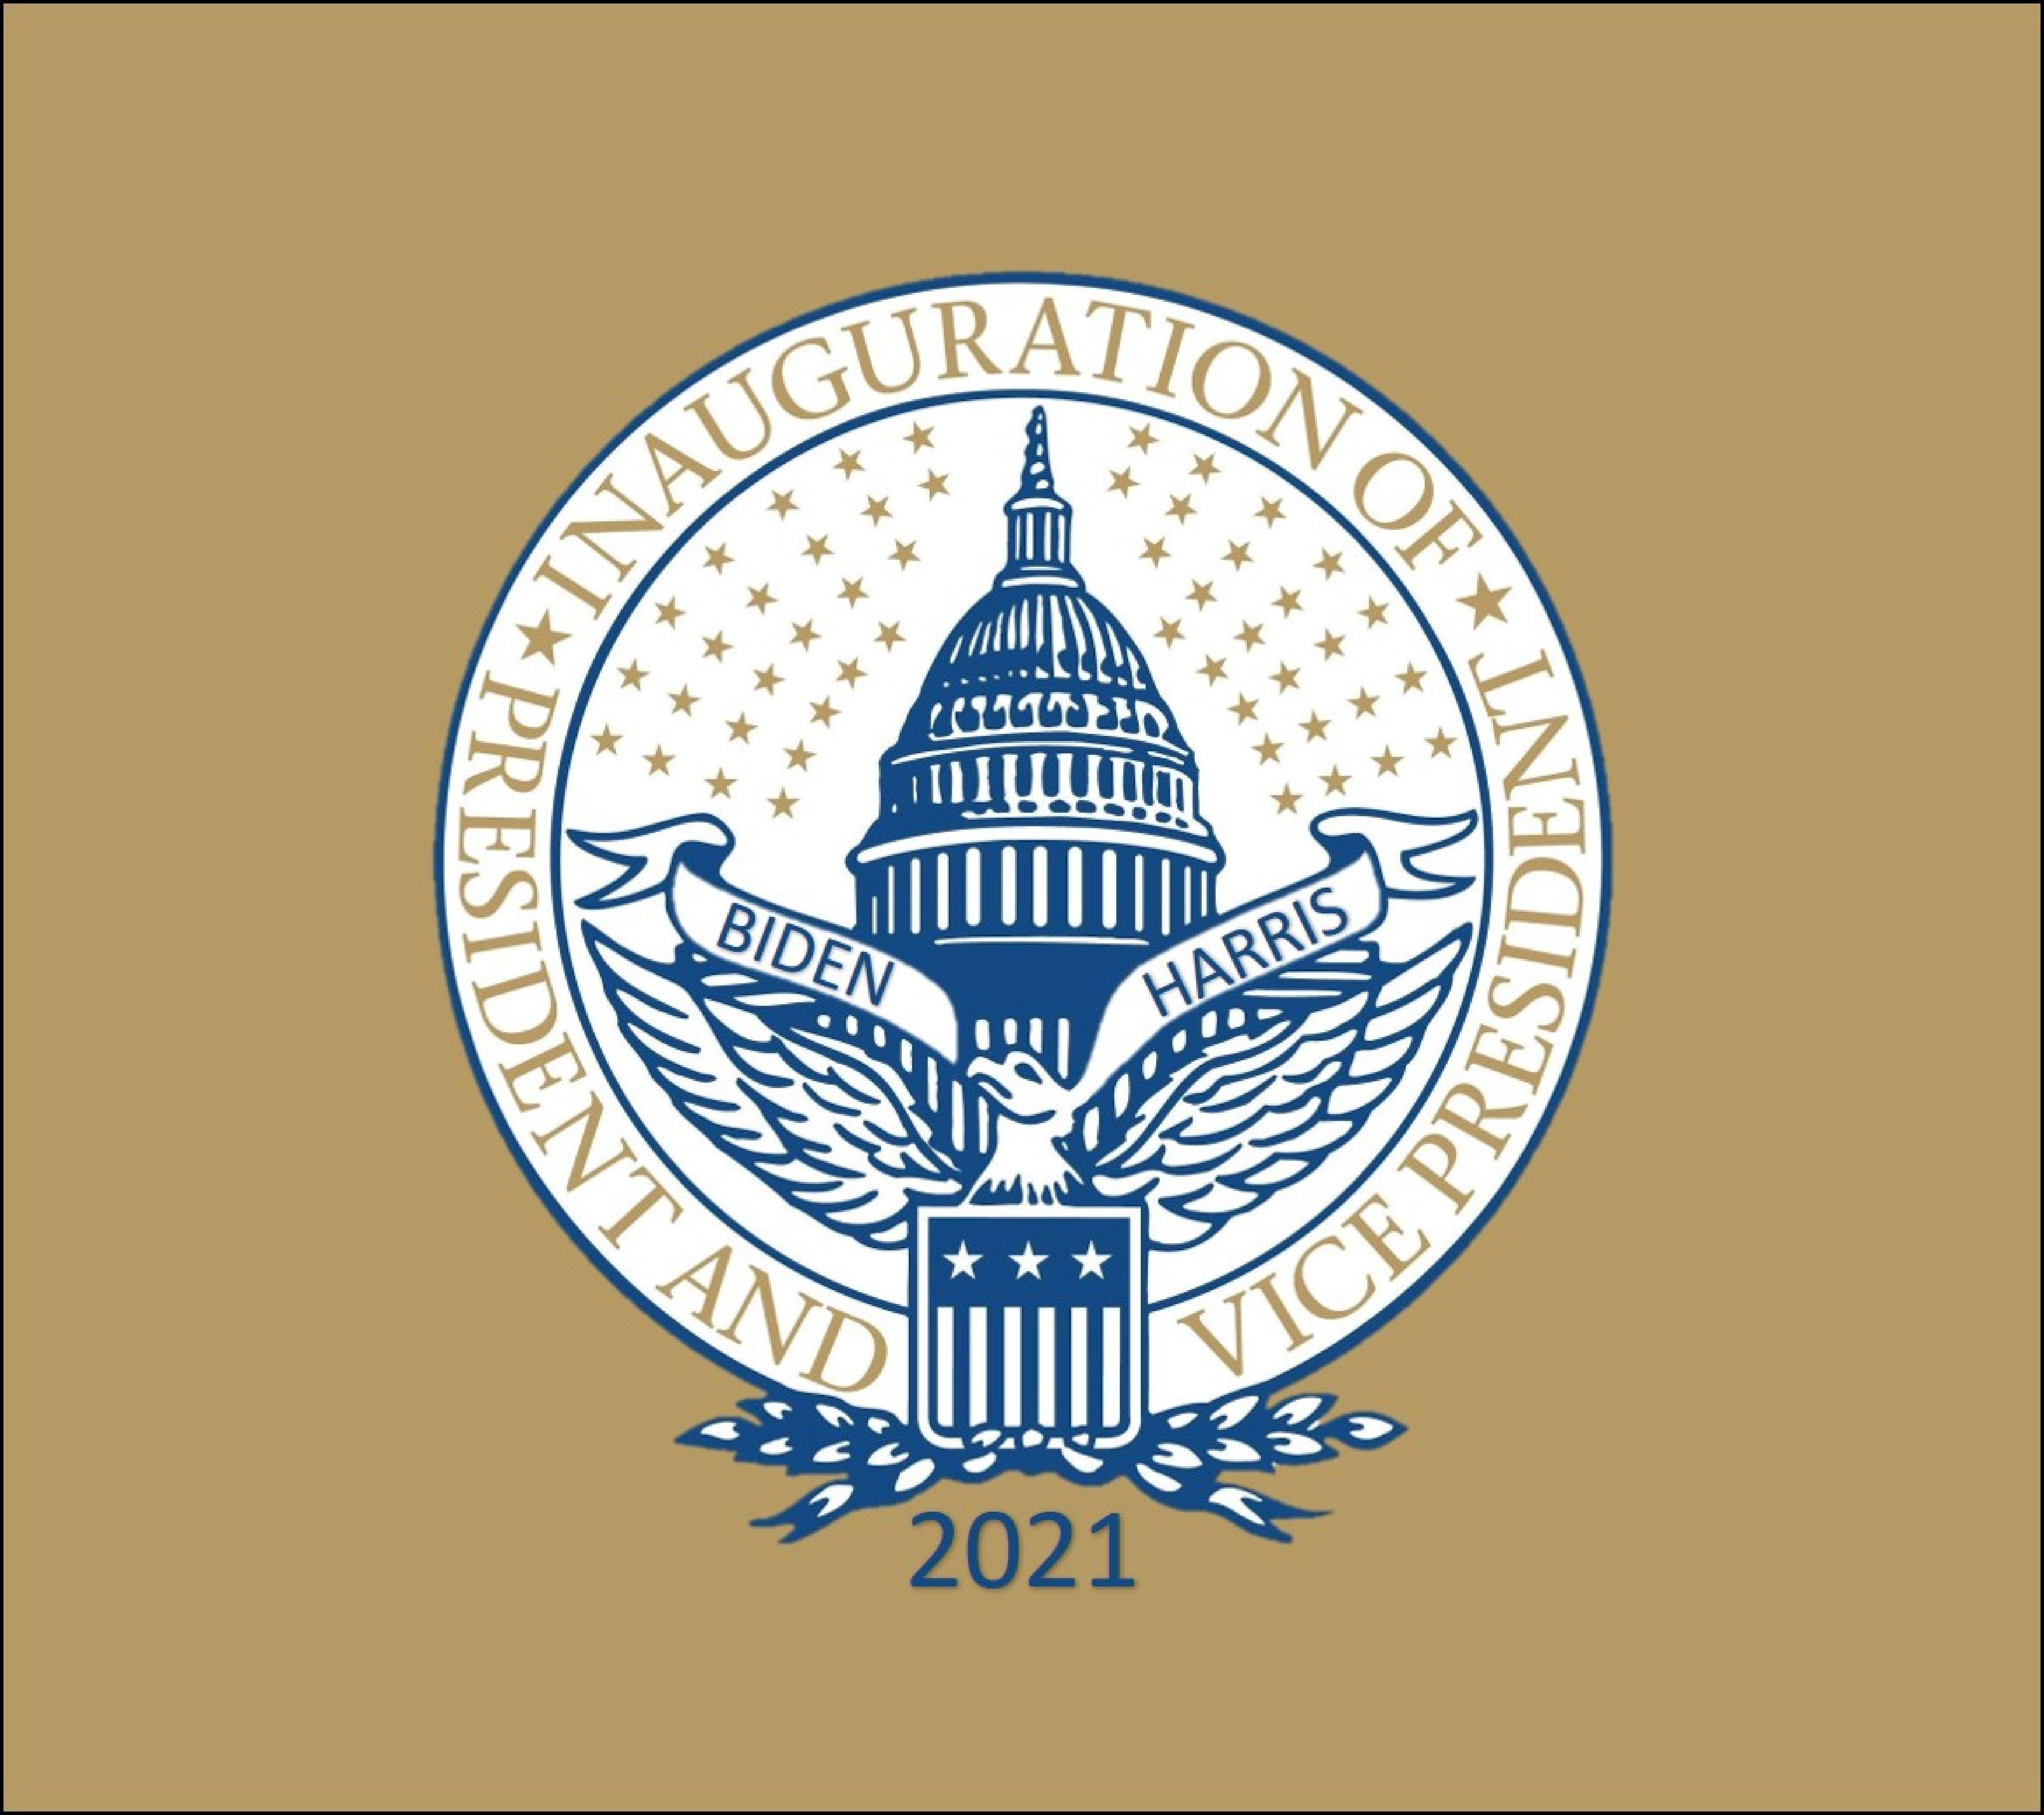 2021 Inauguration Day Inauguration Presidential Inauguration Day